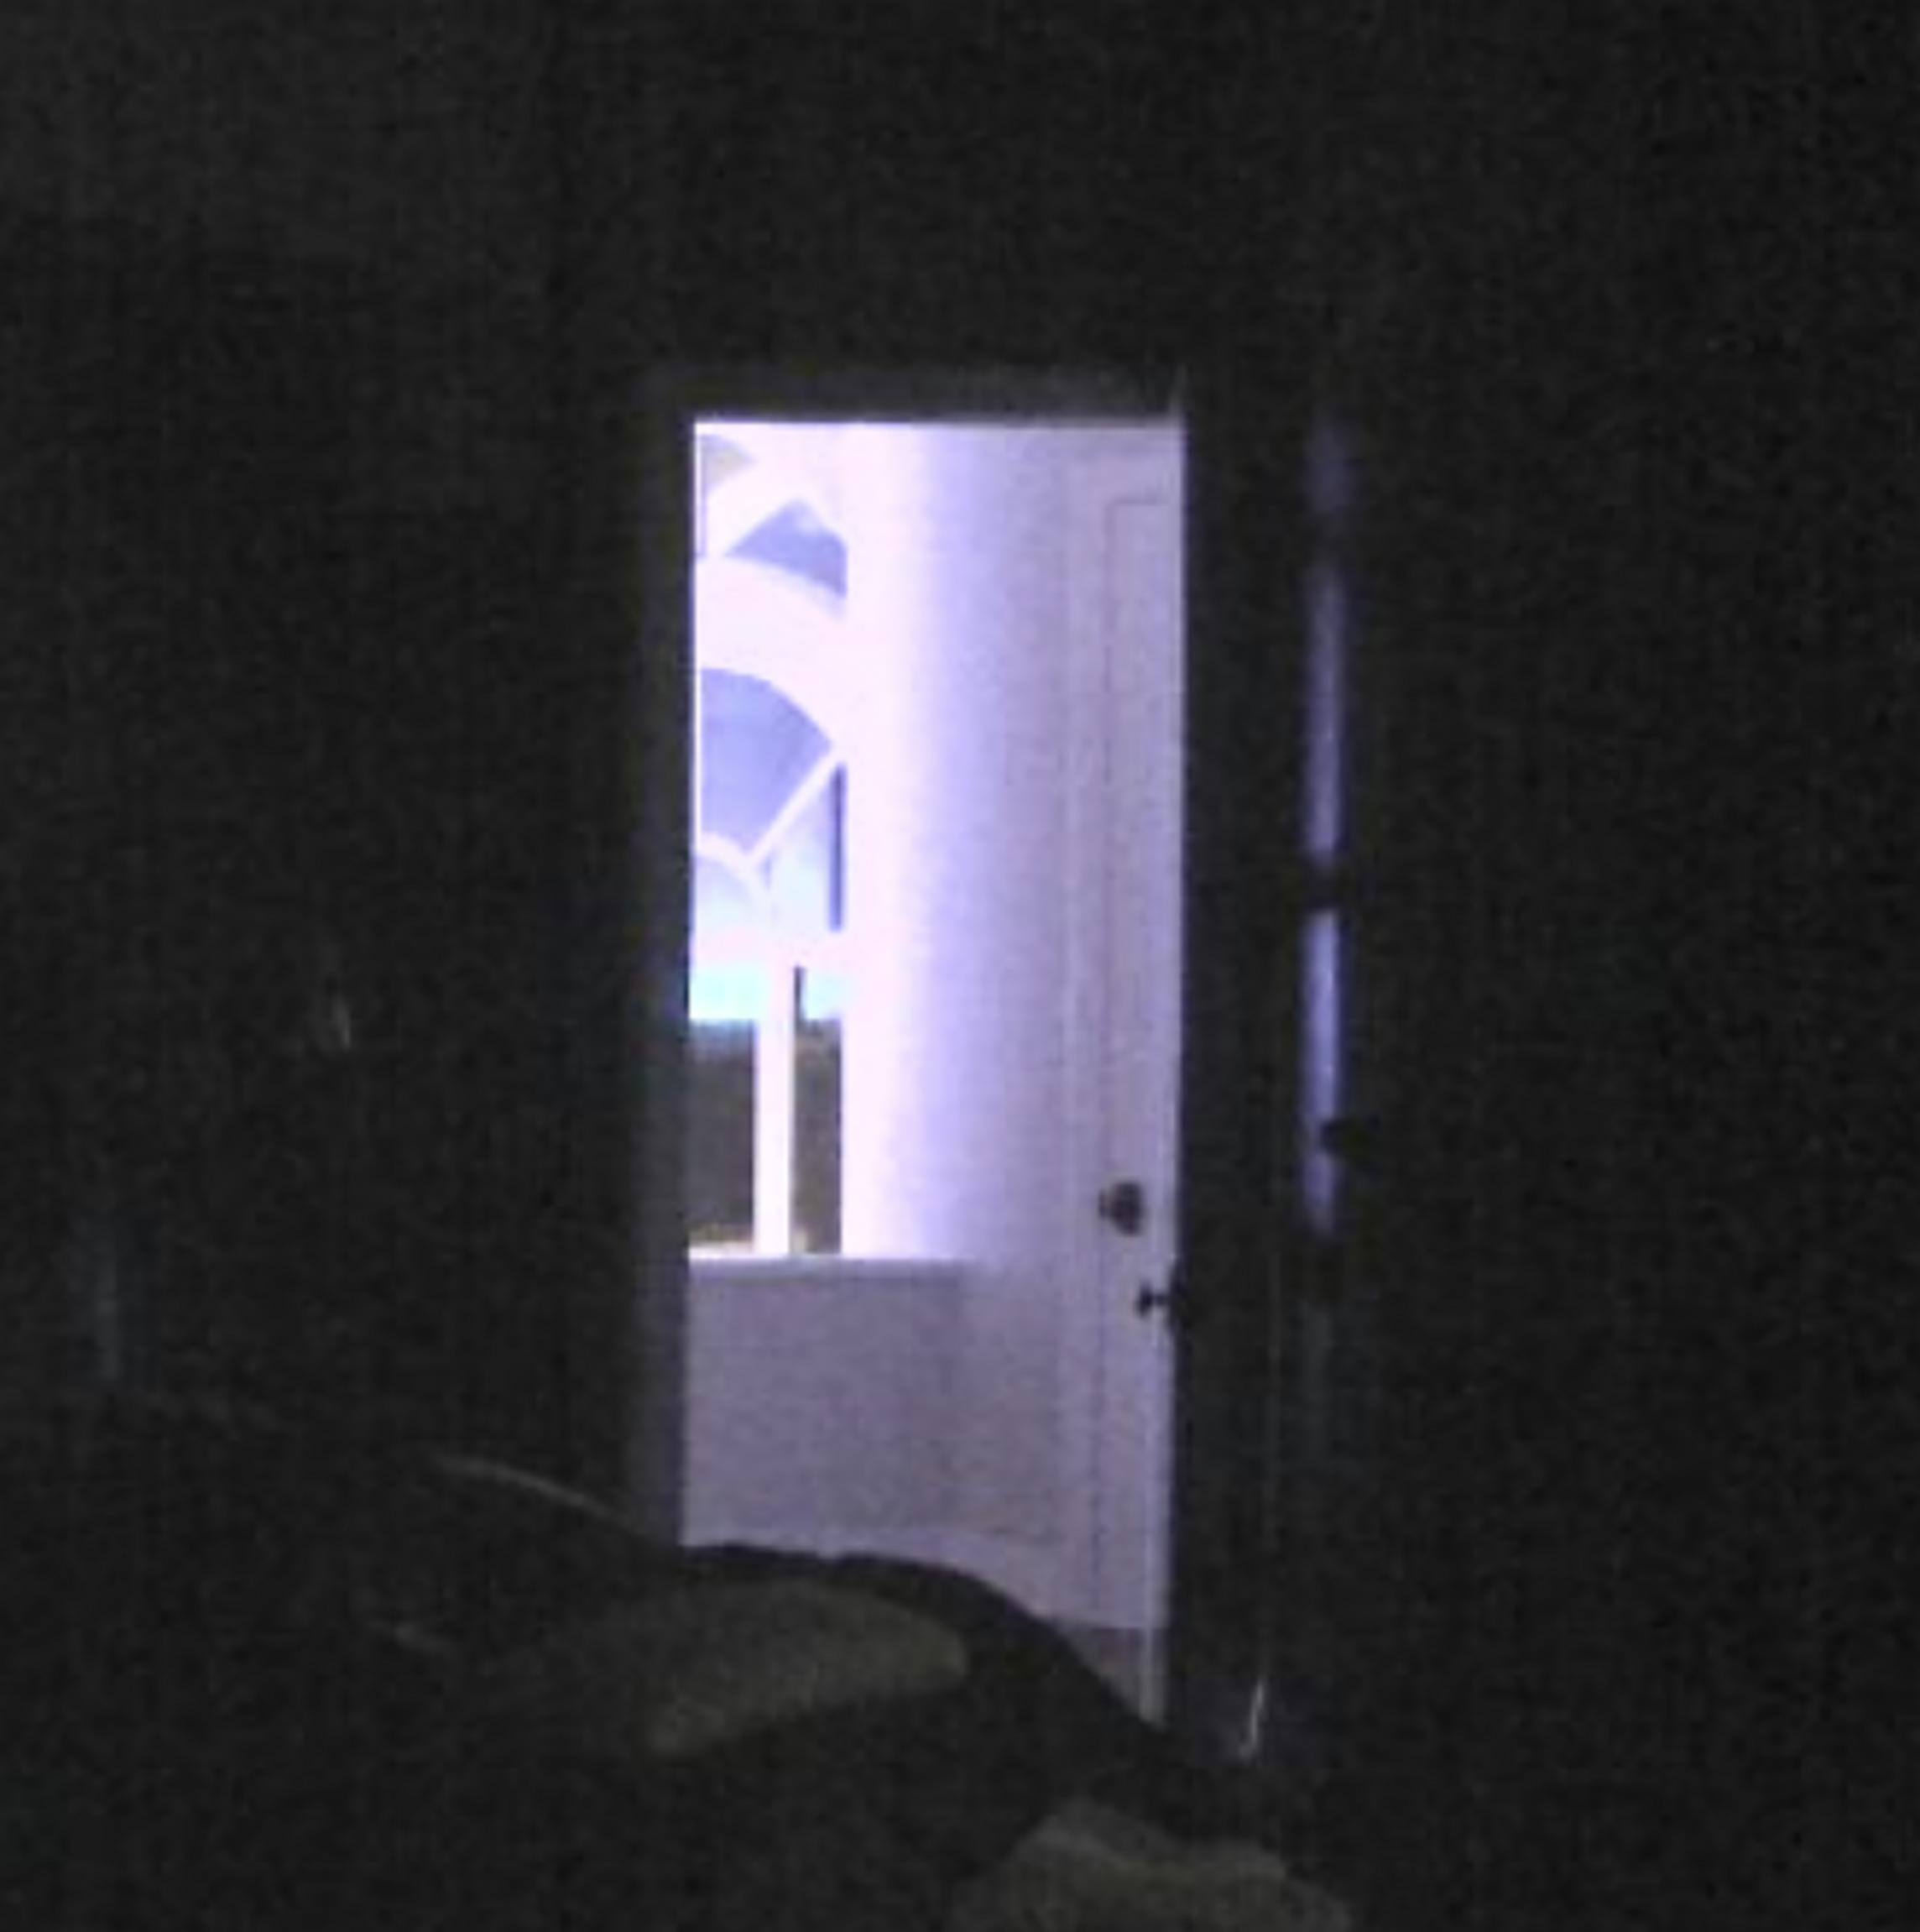 02_BedroominTexasDetailShot_2017_InkjetPrintonVinyl_DimensionsVariable_ClearedforMedia.jpg